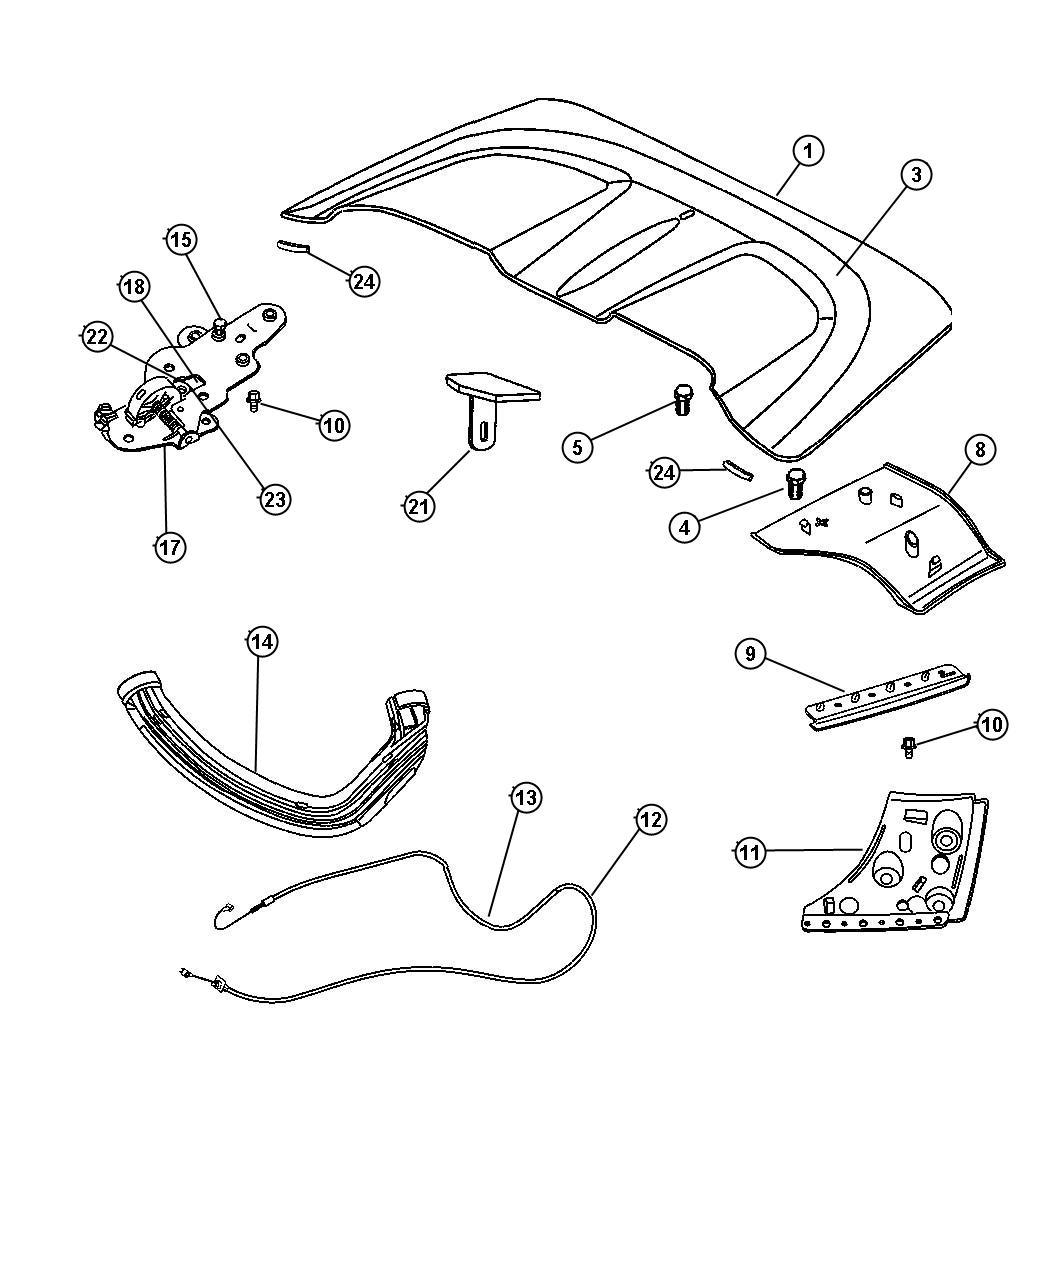 Chrysler Crossfire Seal. Tonneau side flap. Right. Flaps